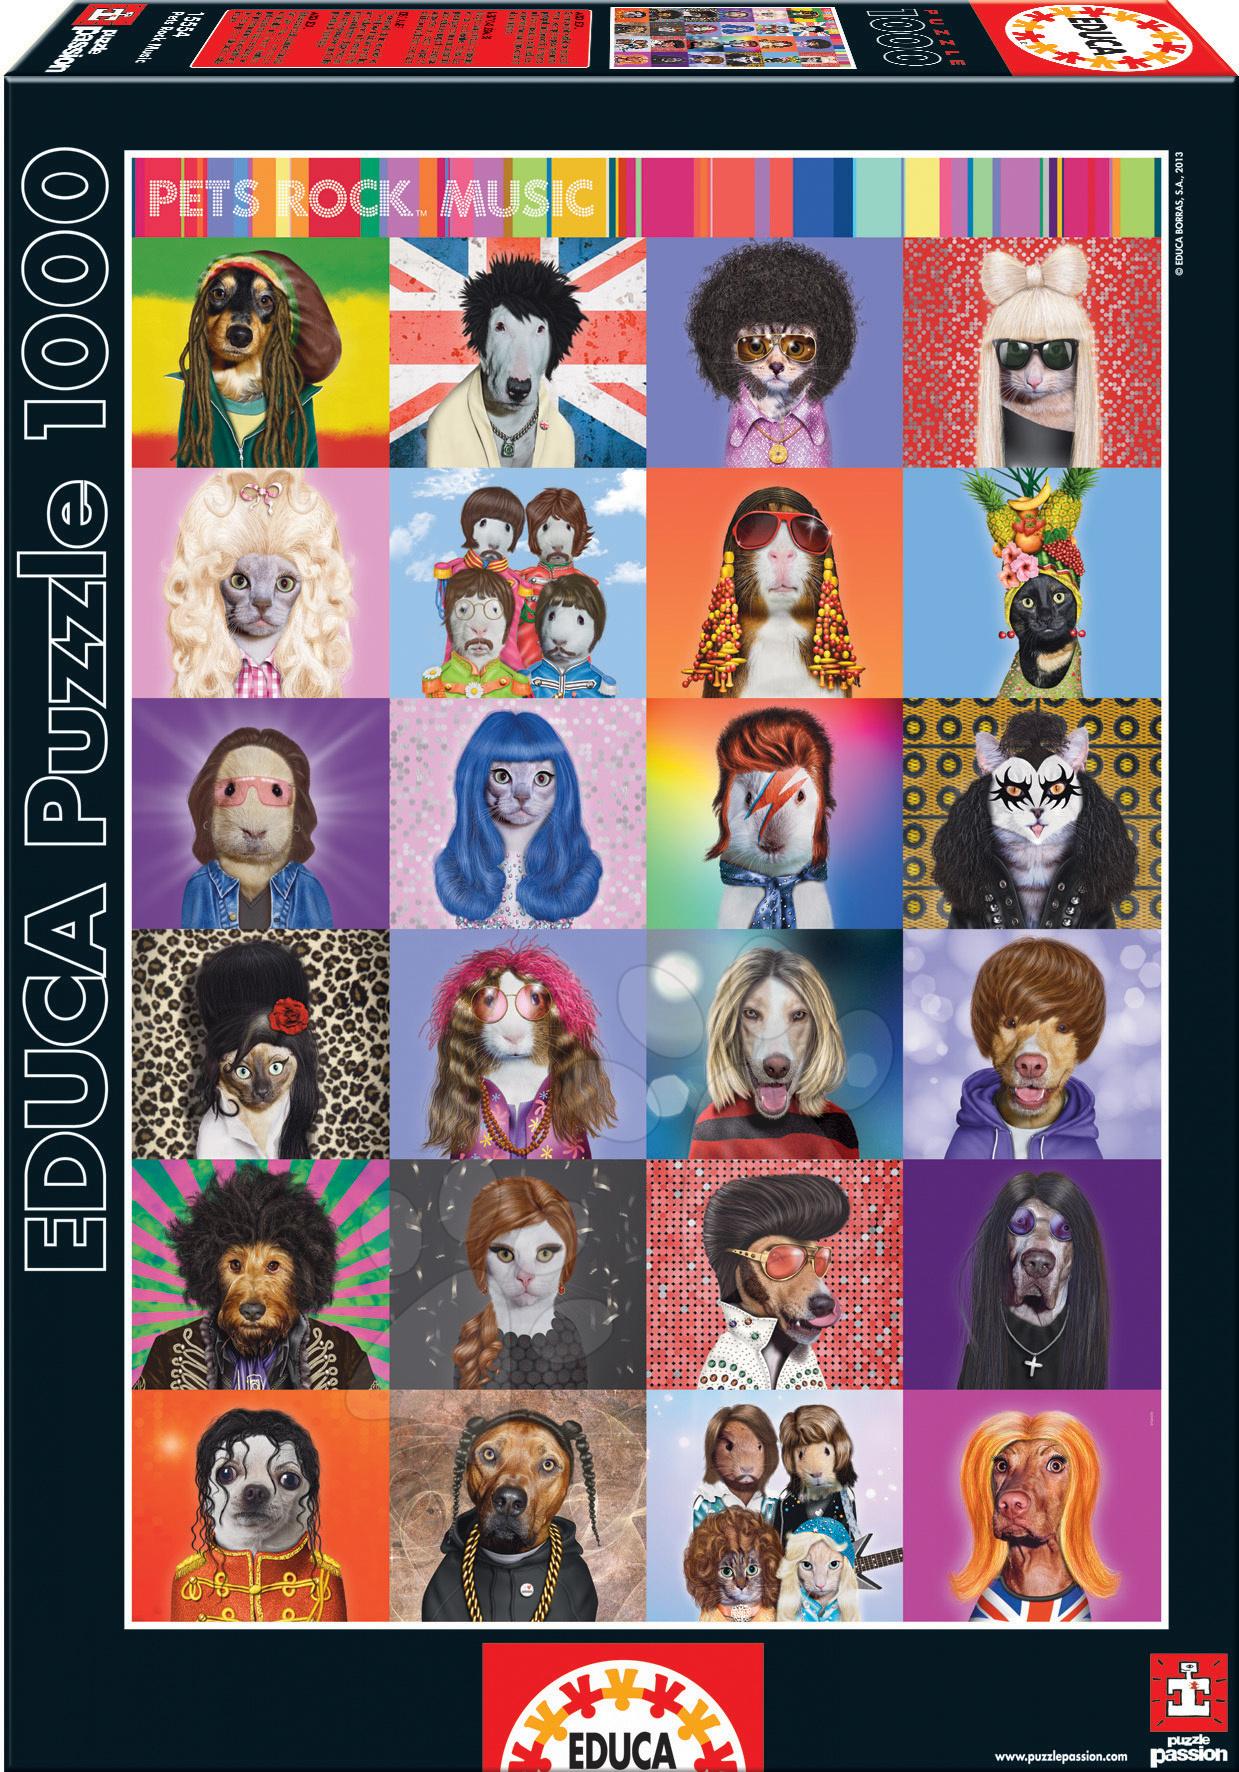 Puzzle Pets Rock Music Educa 1000 dielov od 12 rokov